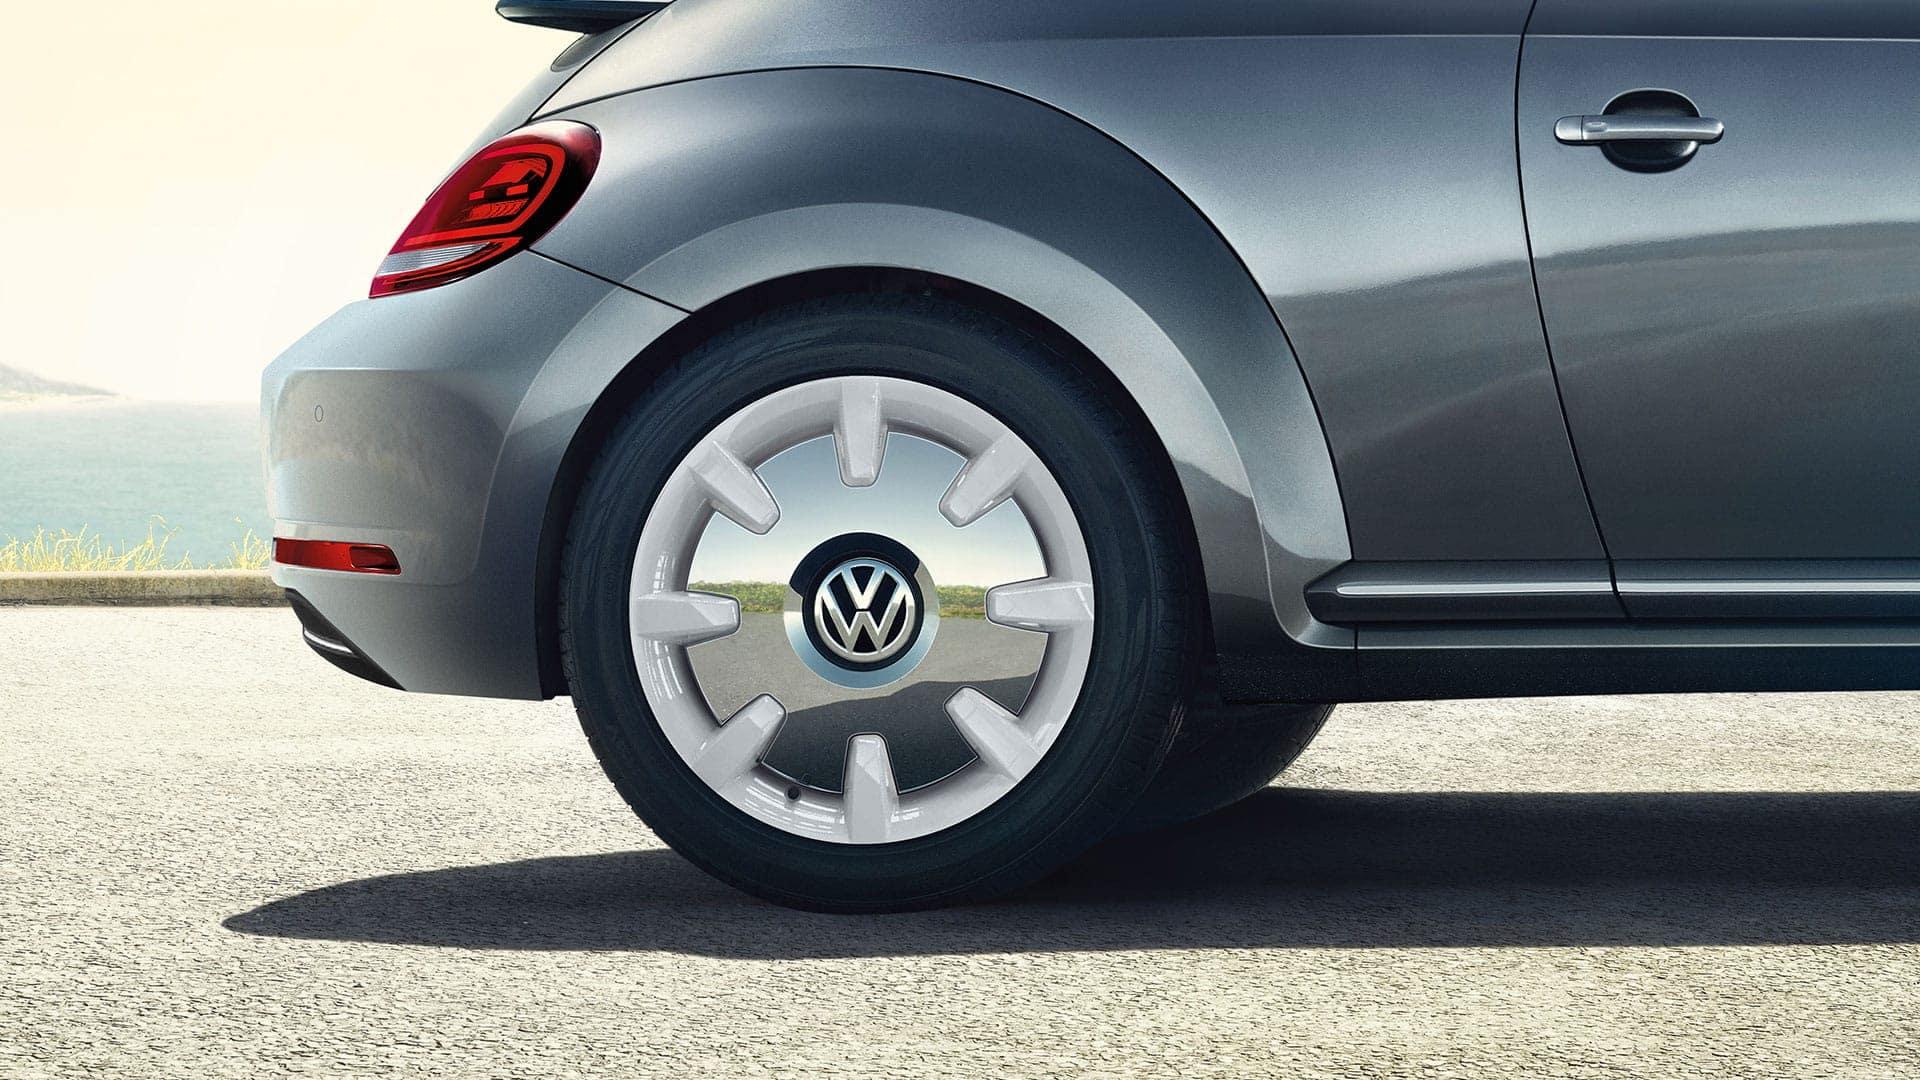 2019 VW Beetle wheels